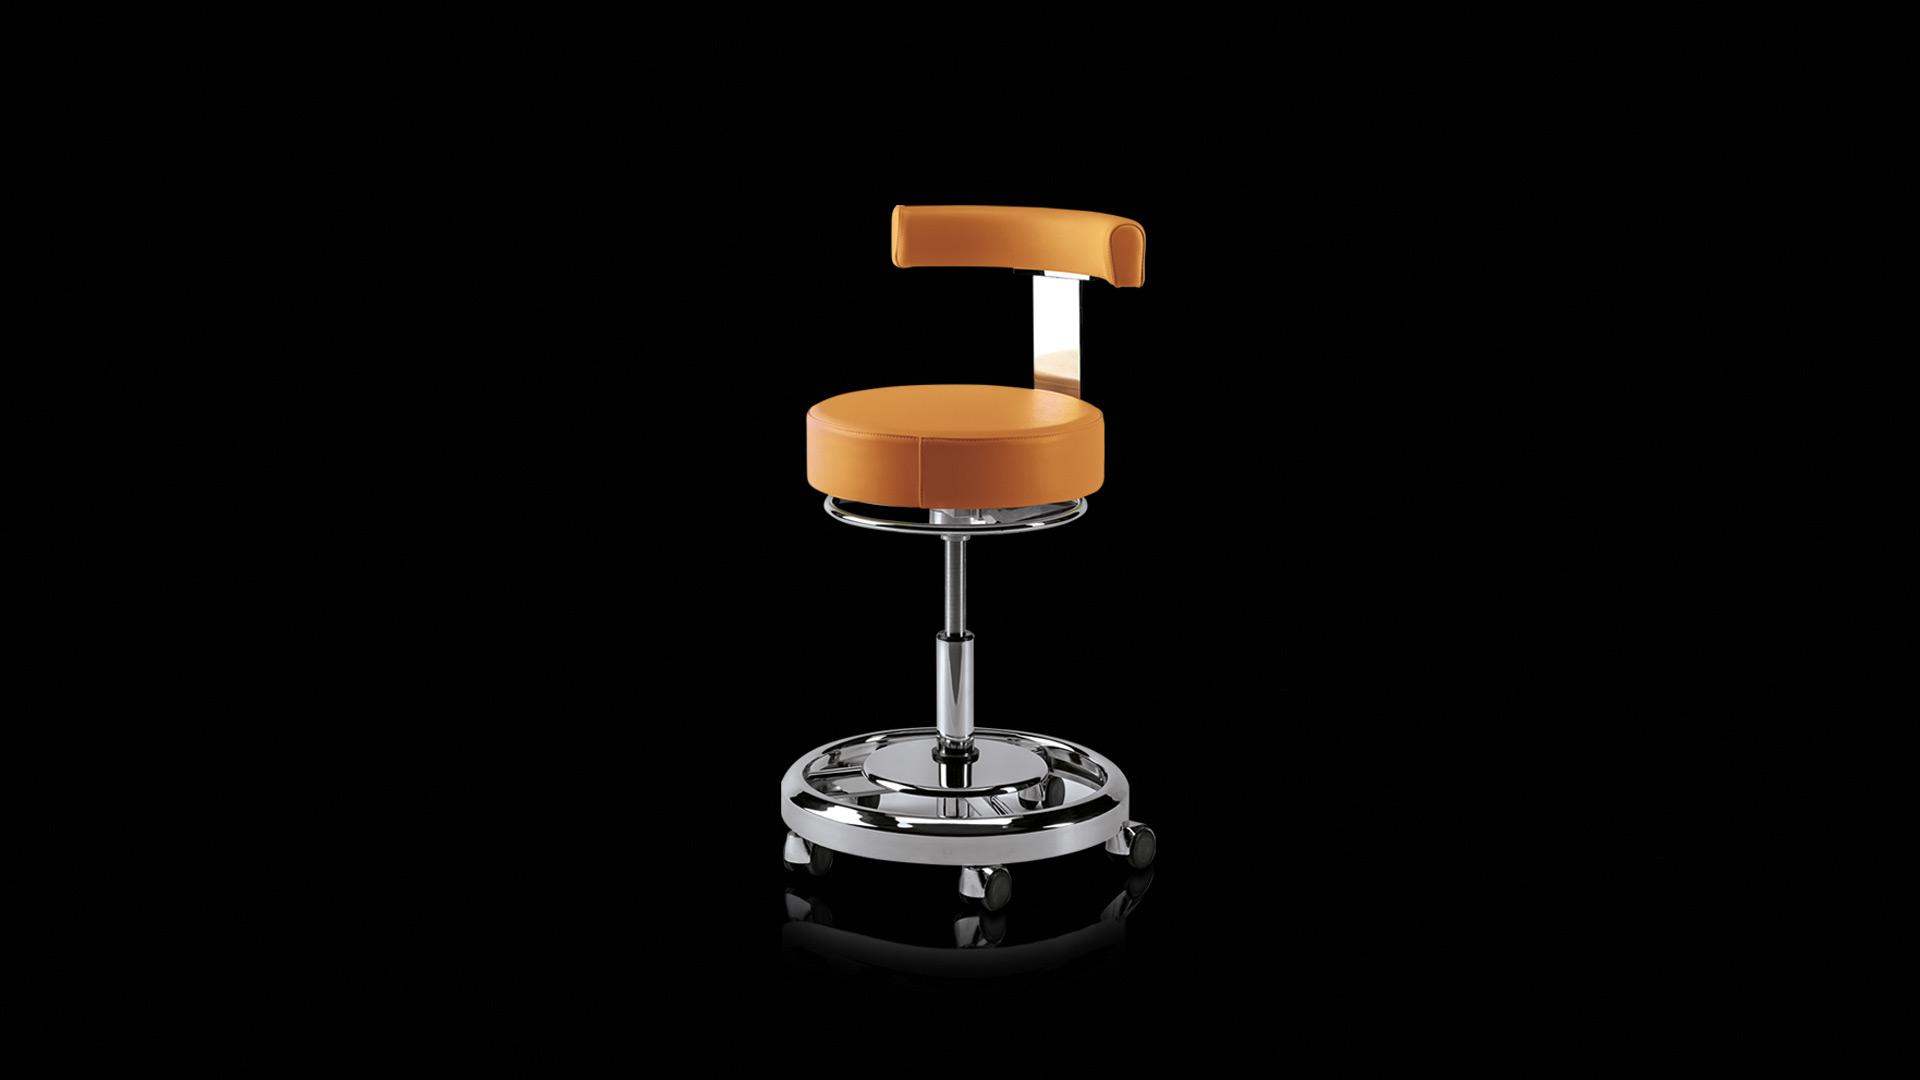 seggiolino arancione - orange stool